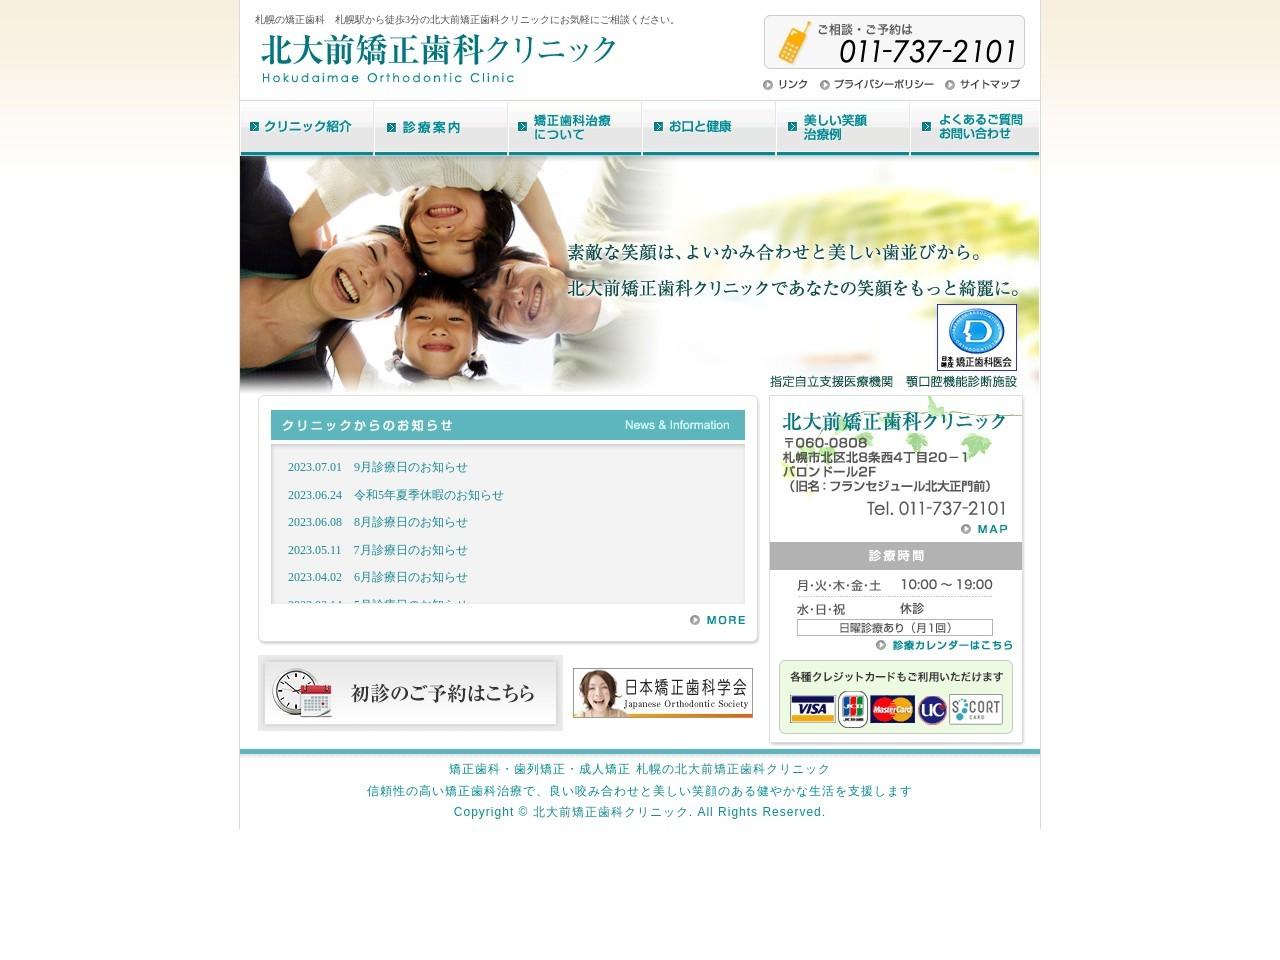 北大前矯正歯科クリニック (北海道札幌市北区)